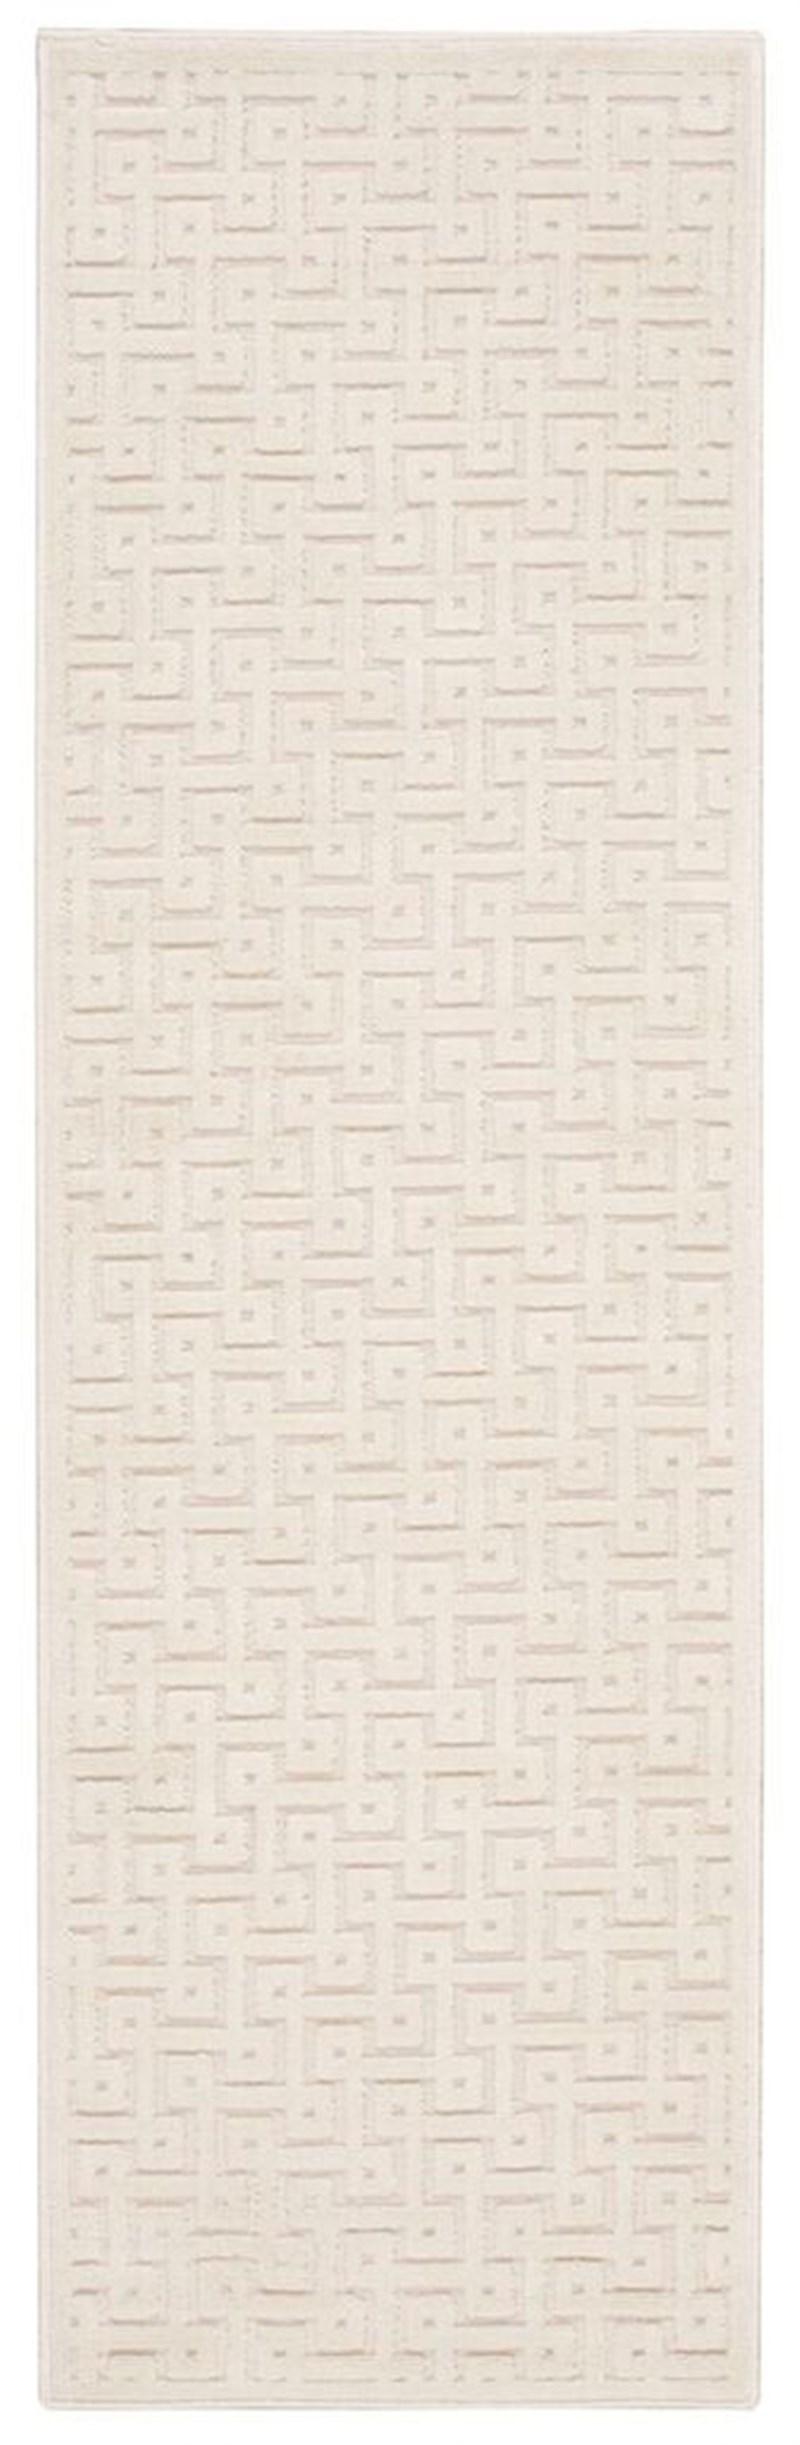 nourison-ultima-ivory-ivory-area-rug